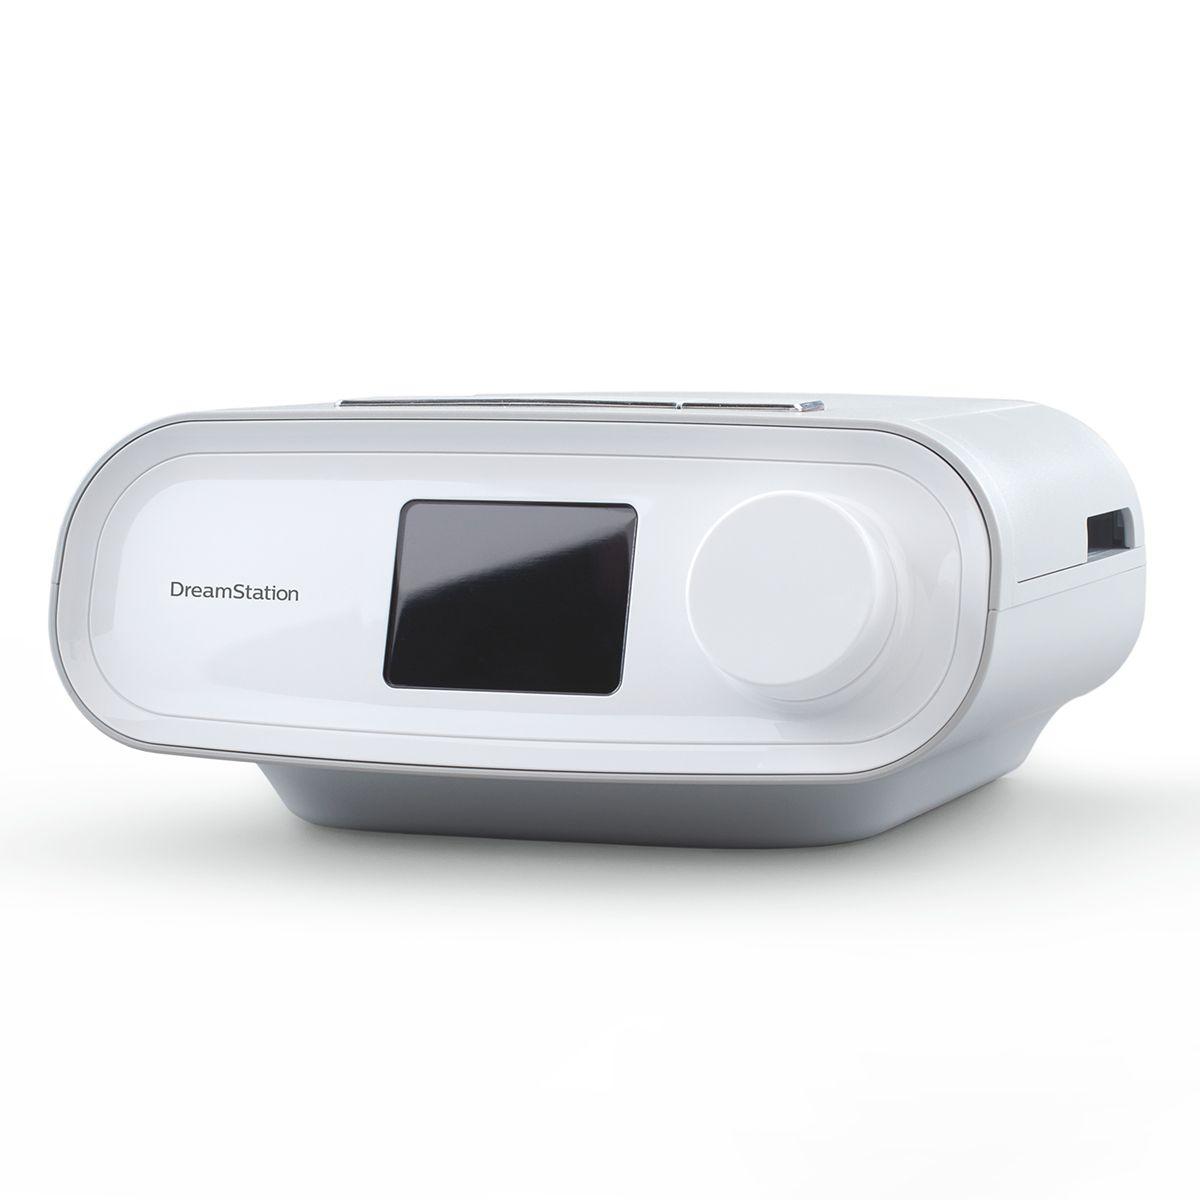 Kit CPAP Automático DreamStation + Umidificador + Máscara Nasal DreamWear Philips Respironics